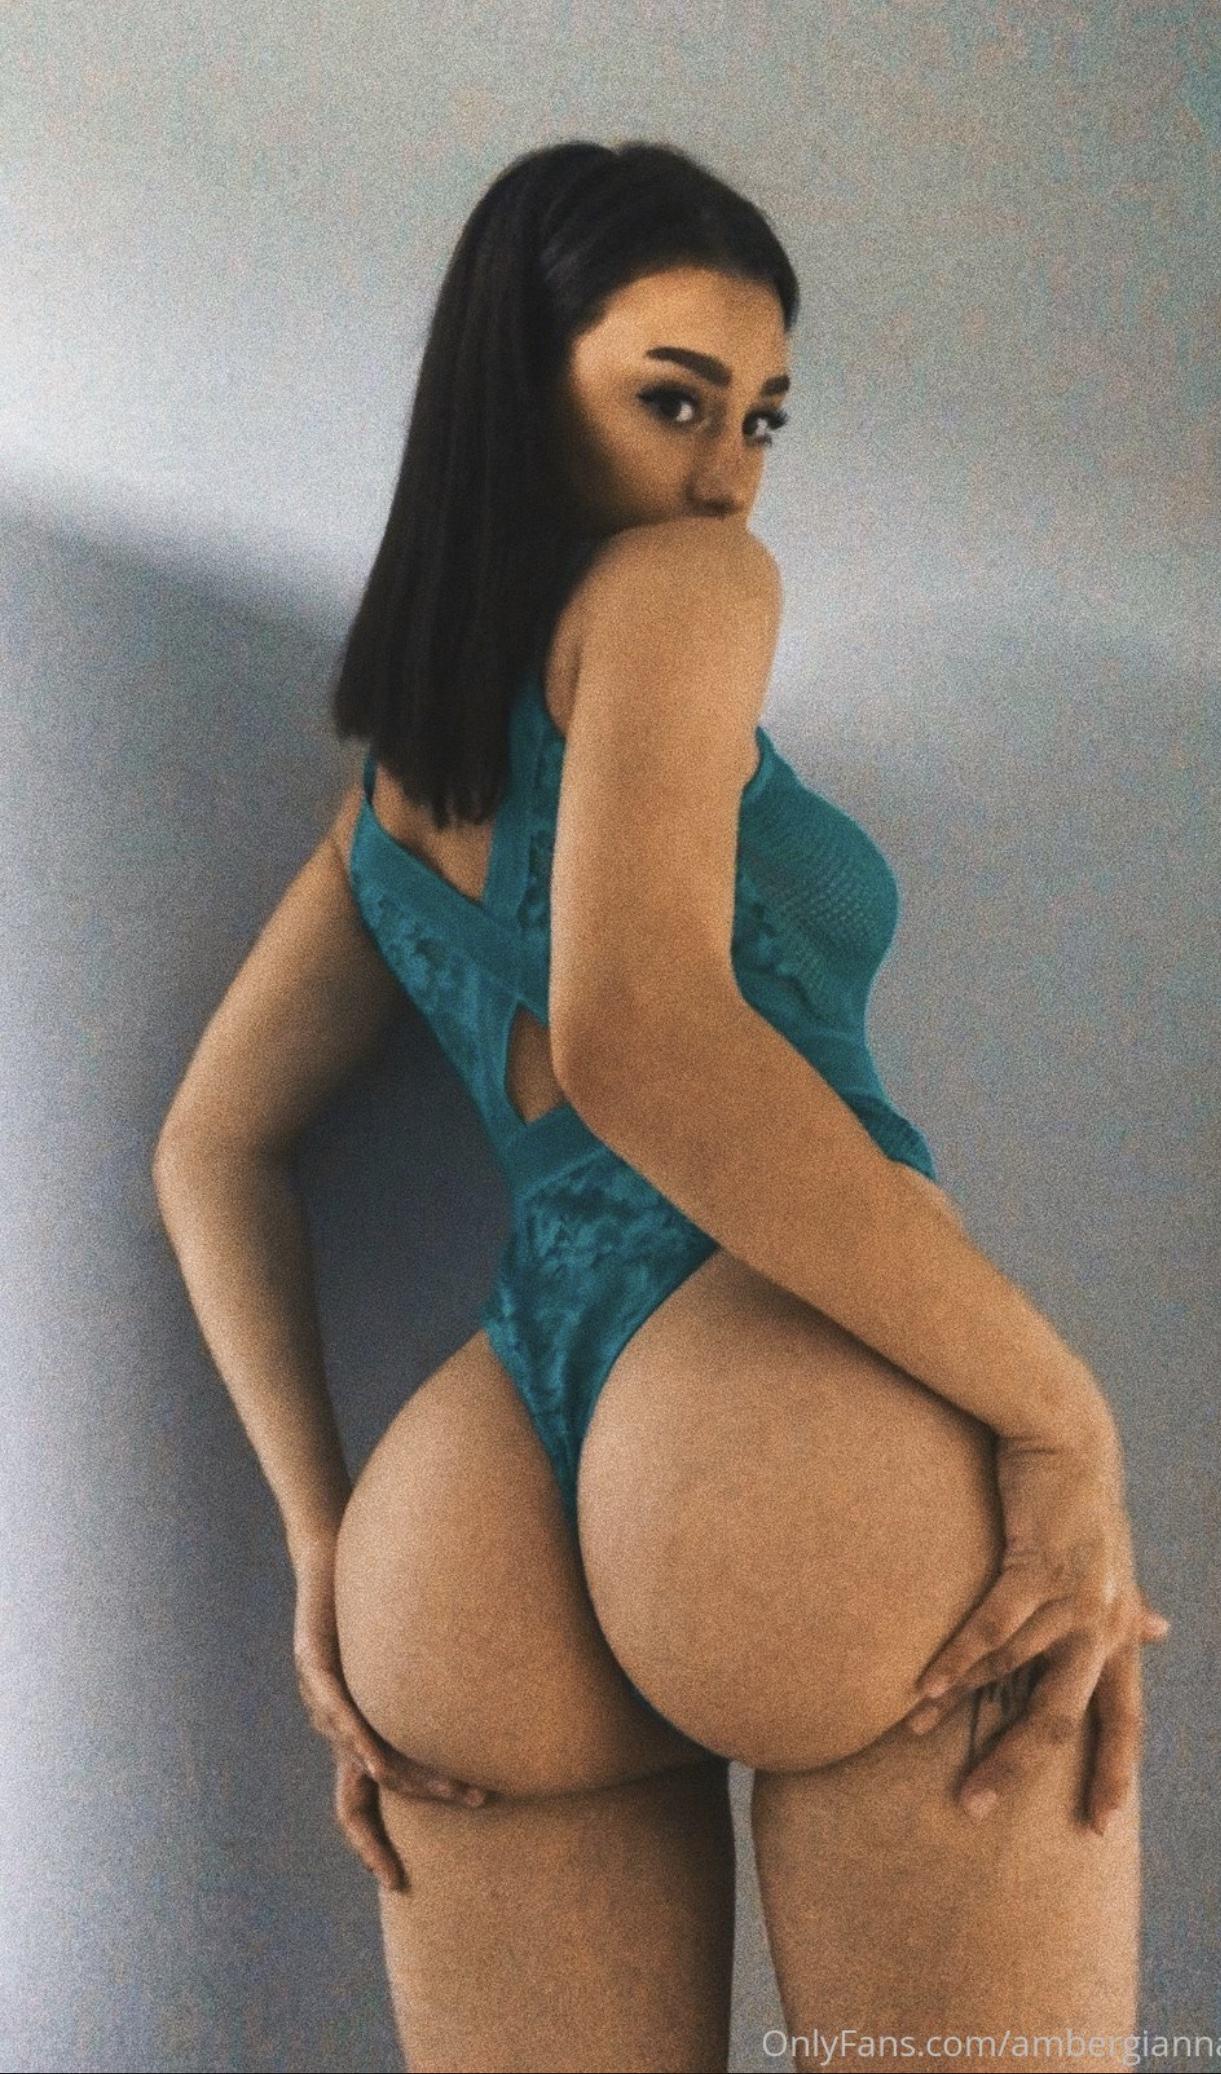 Amber Gianna Leaked 0128